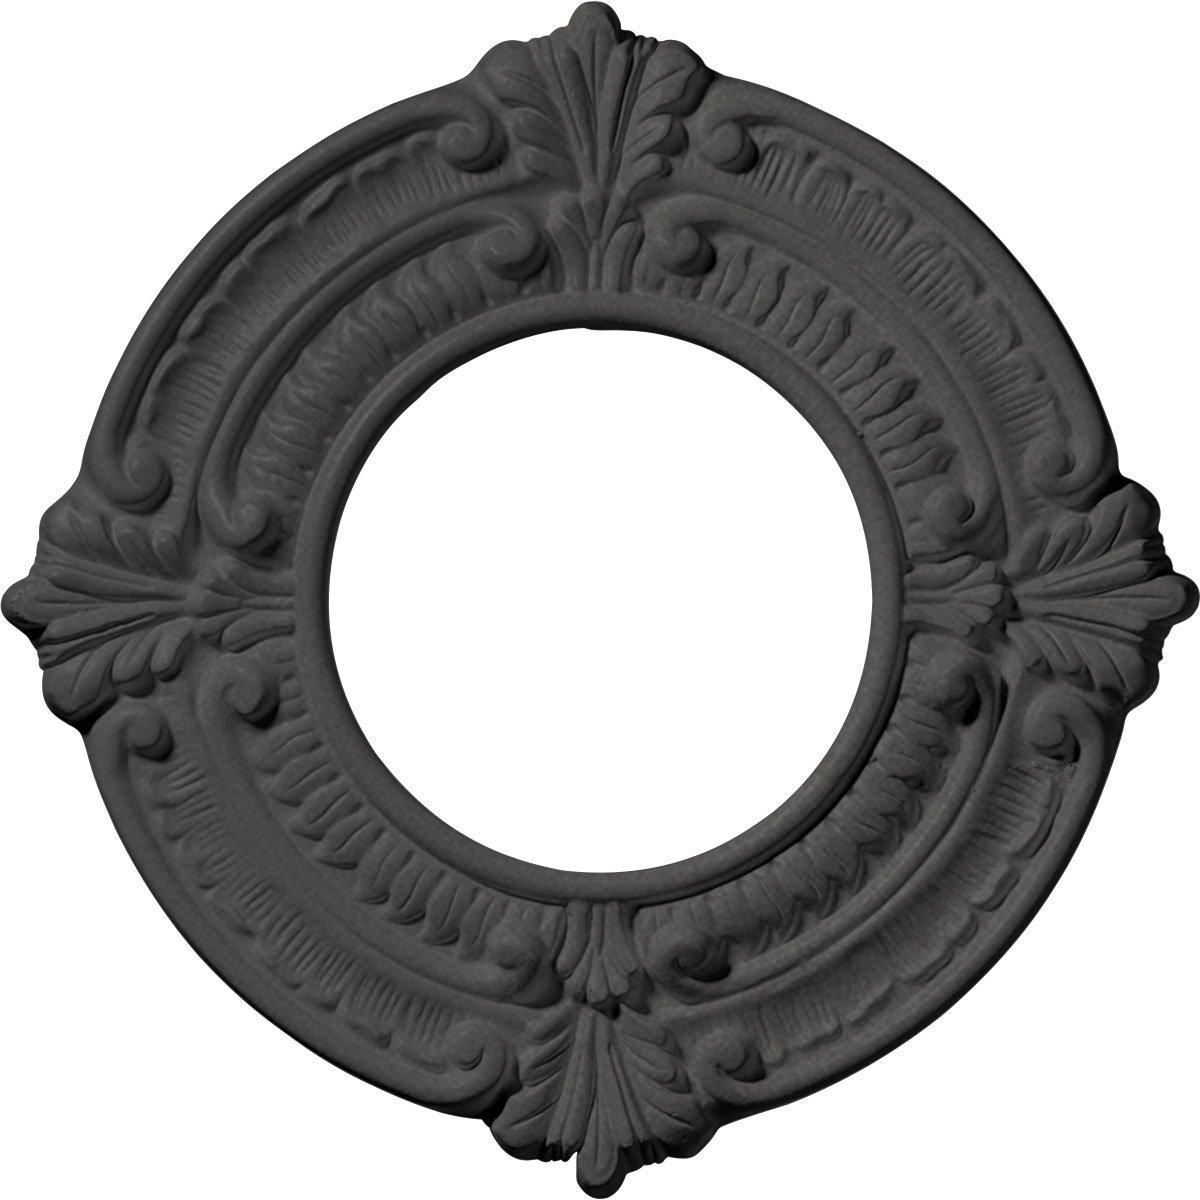 Ekena Millwork CM09BNSGS 9'' x 4-1/8'' x 5/8'' Benson Ceiling Medallion, Steel Gray